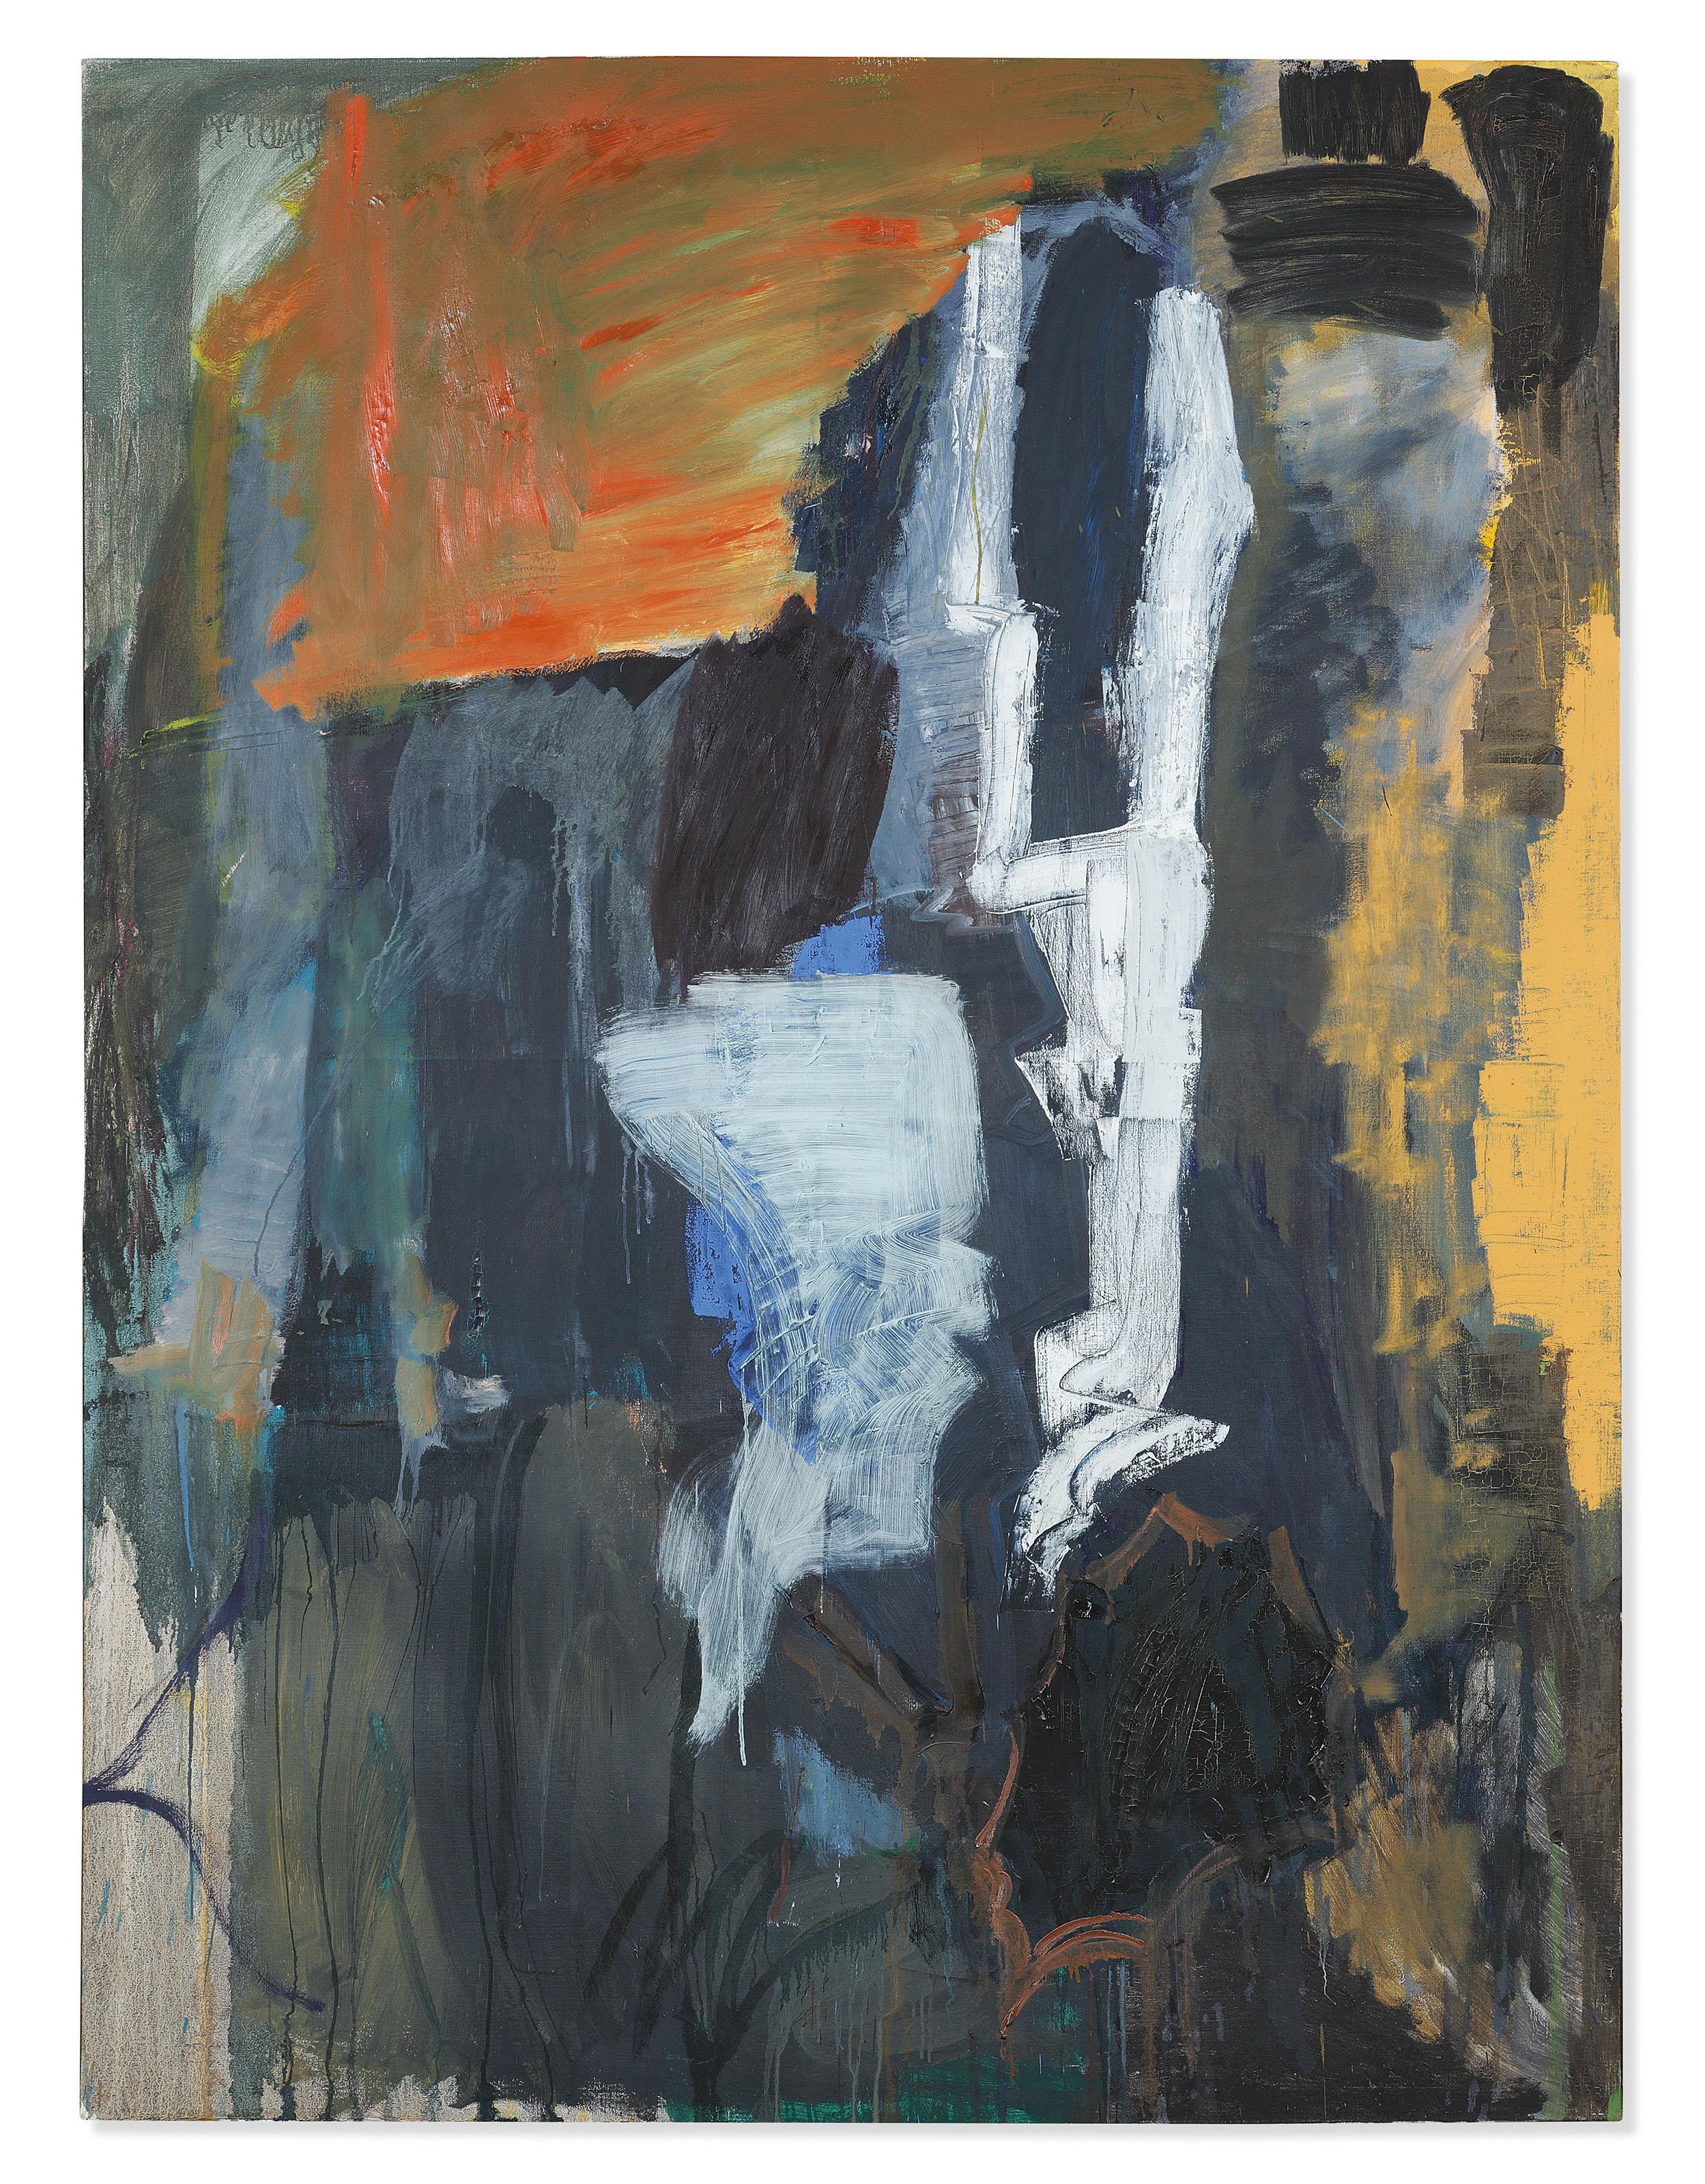 Kirkeby Gegen Abend I (Towards Evening I) 1984 Öl auf Leinwand 200 x 150 cm © Per Kirkeby Estate Foto: Stefan Korte